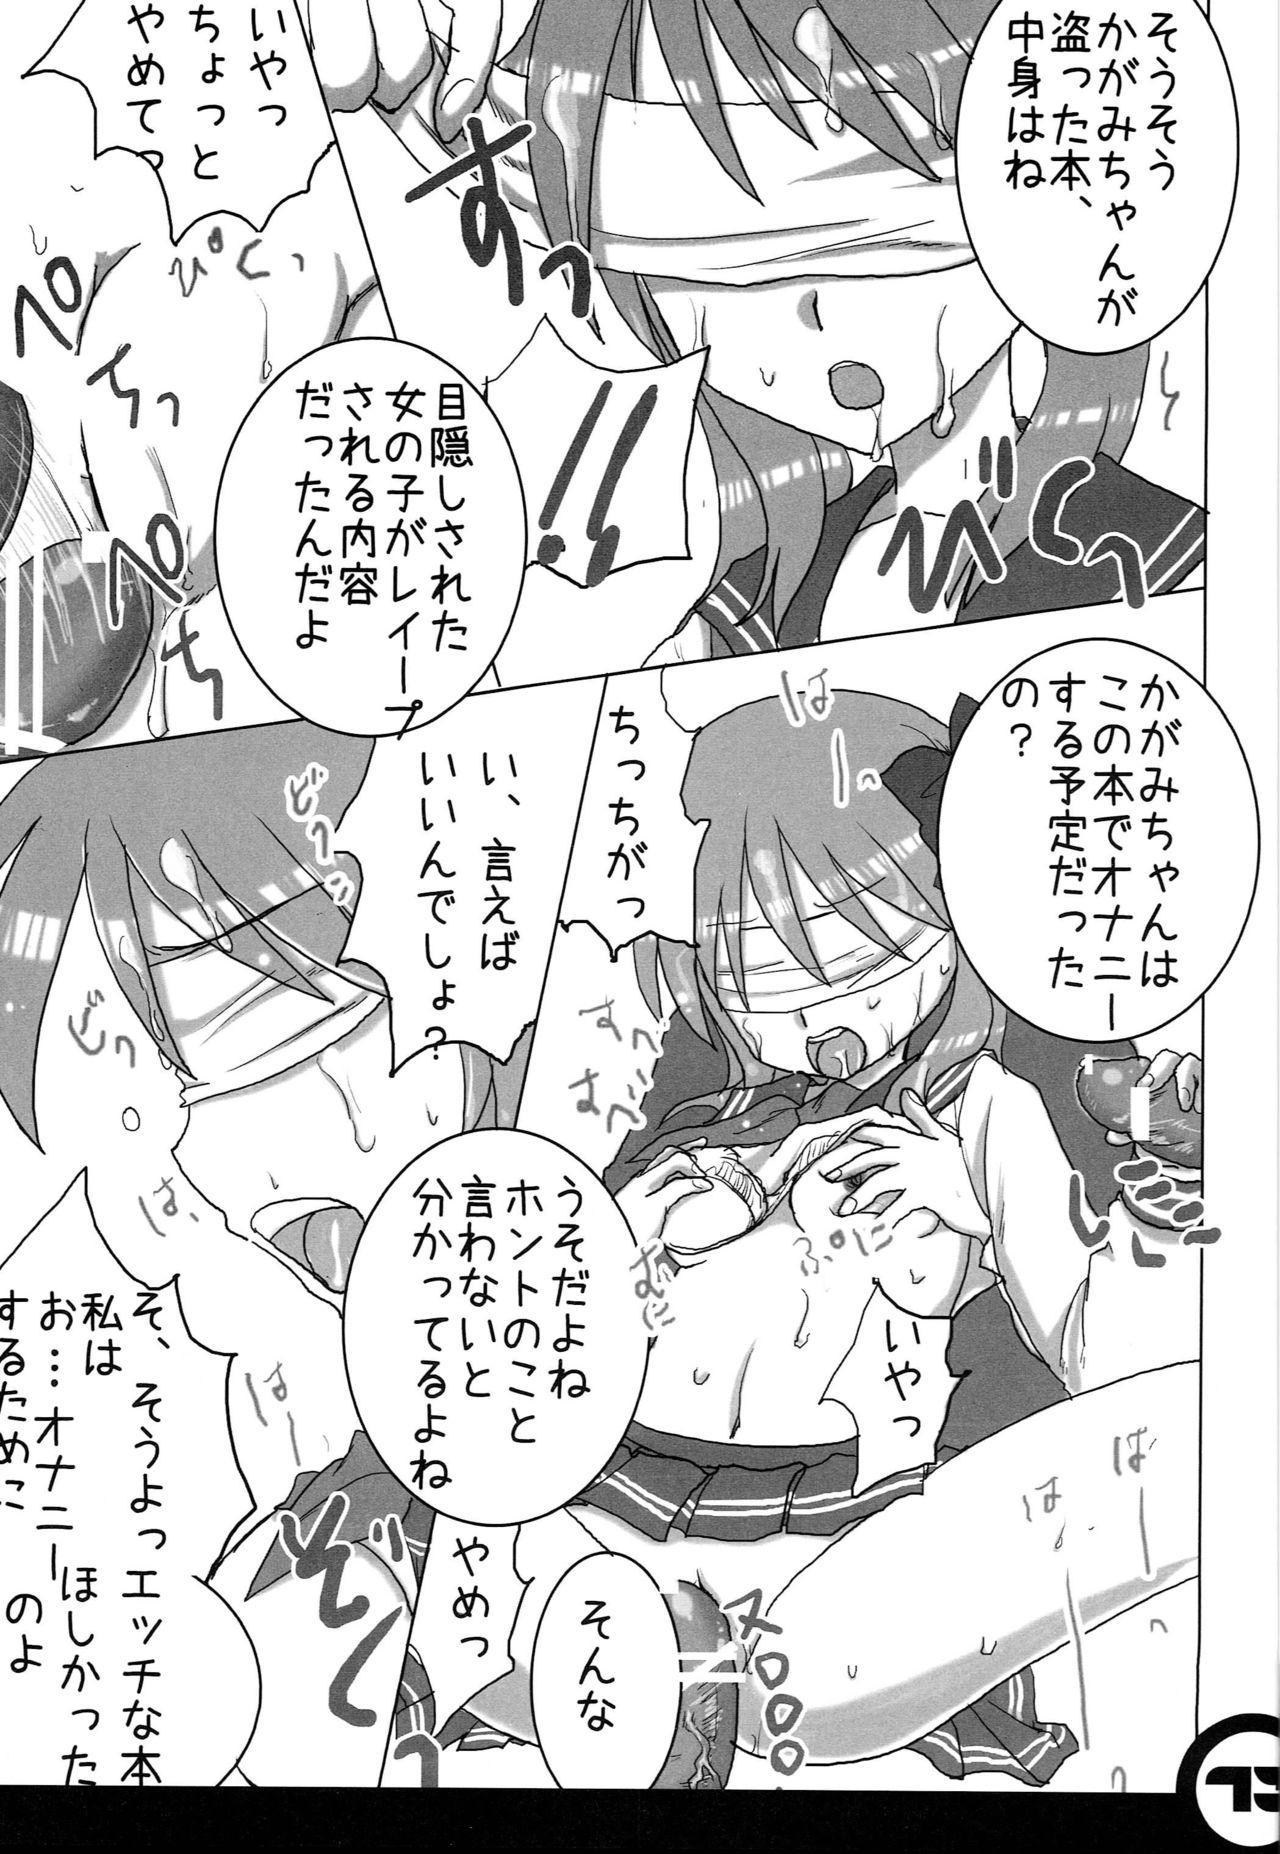 Himitsu no Kagamin 12